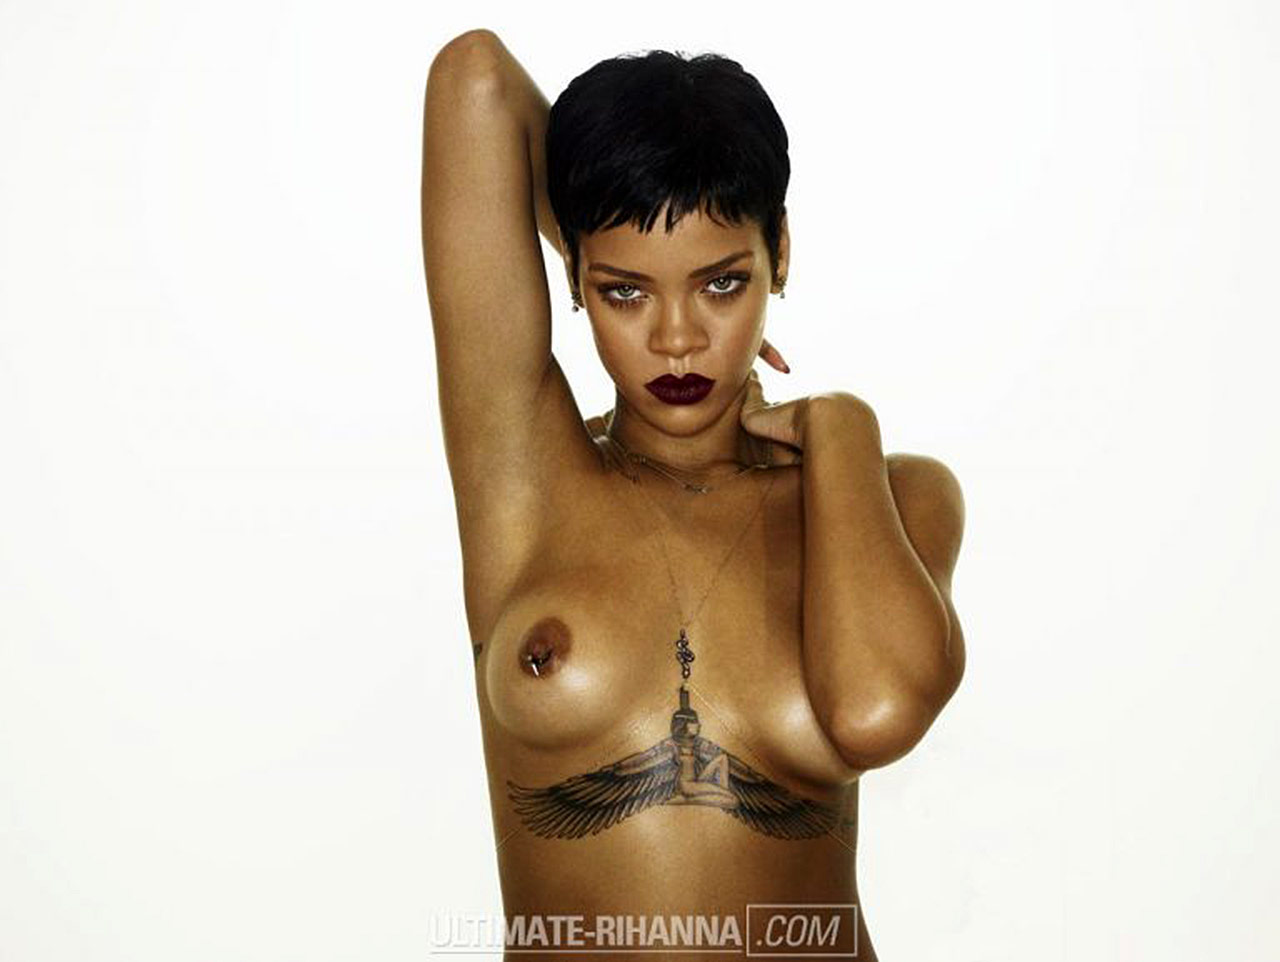 from Ashton rihanna nude with big boobs